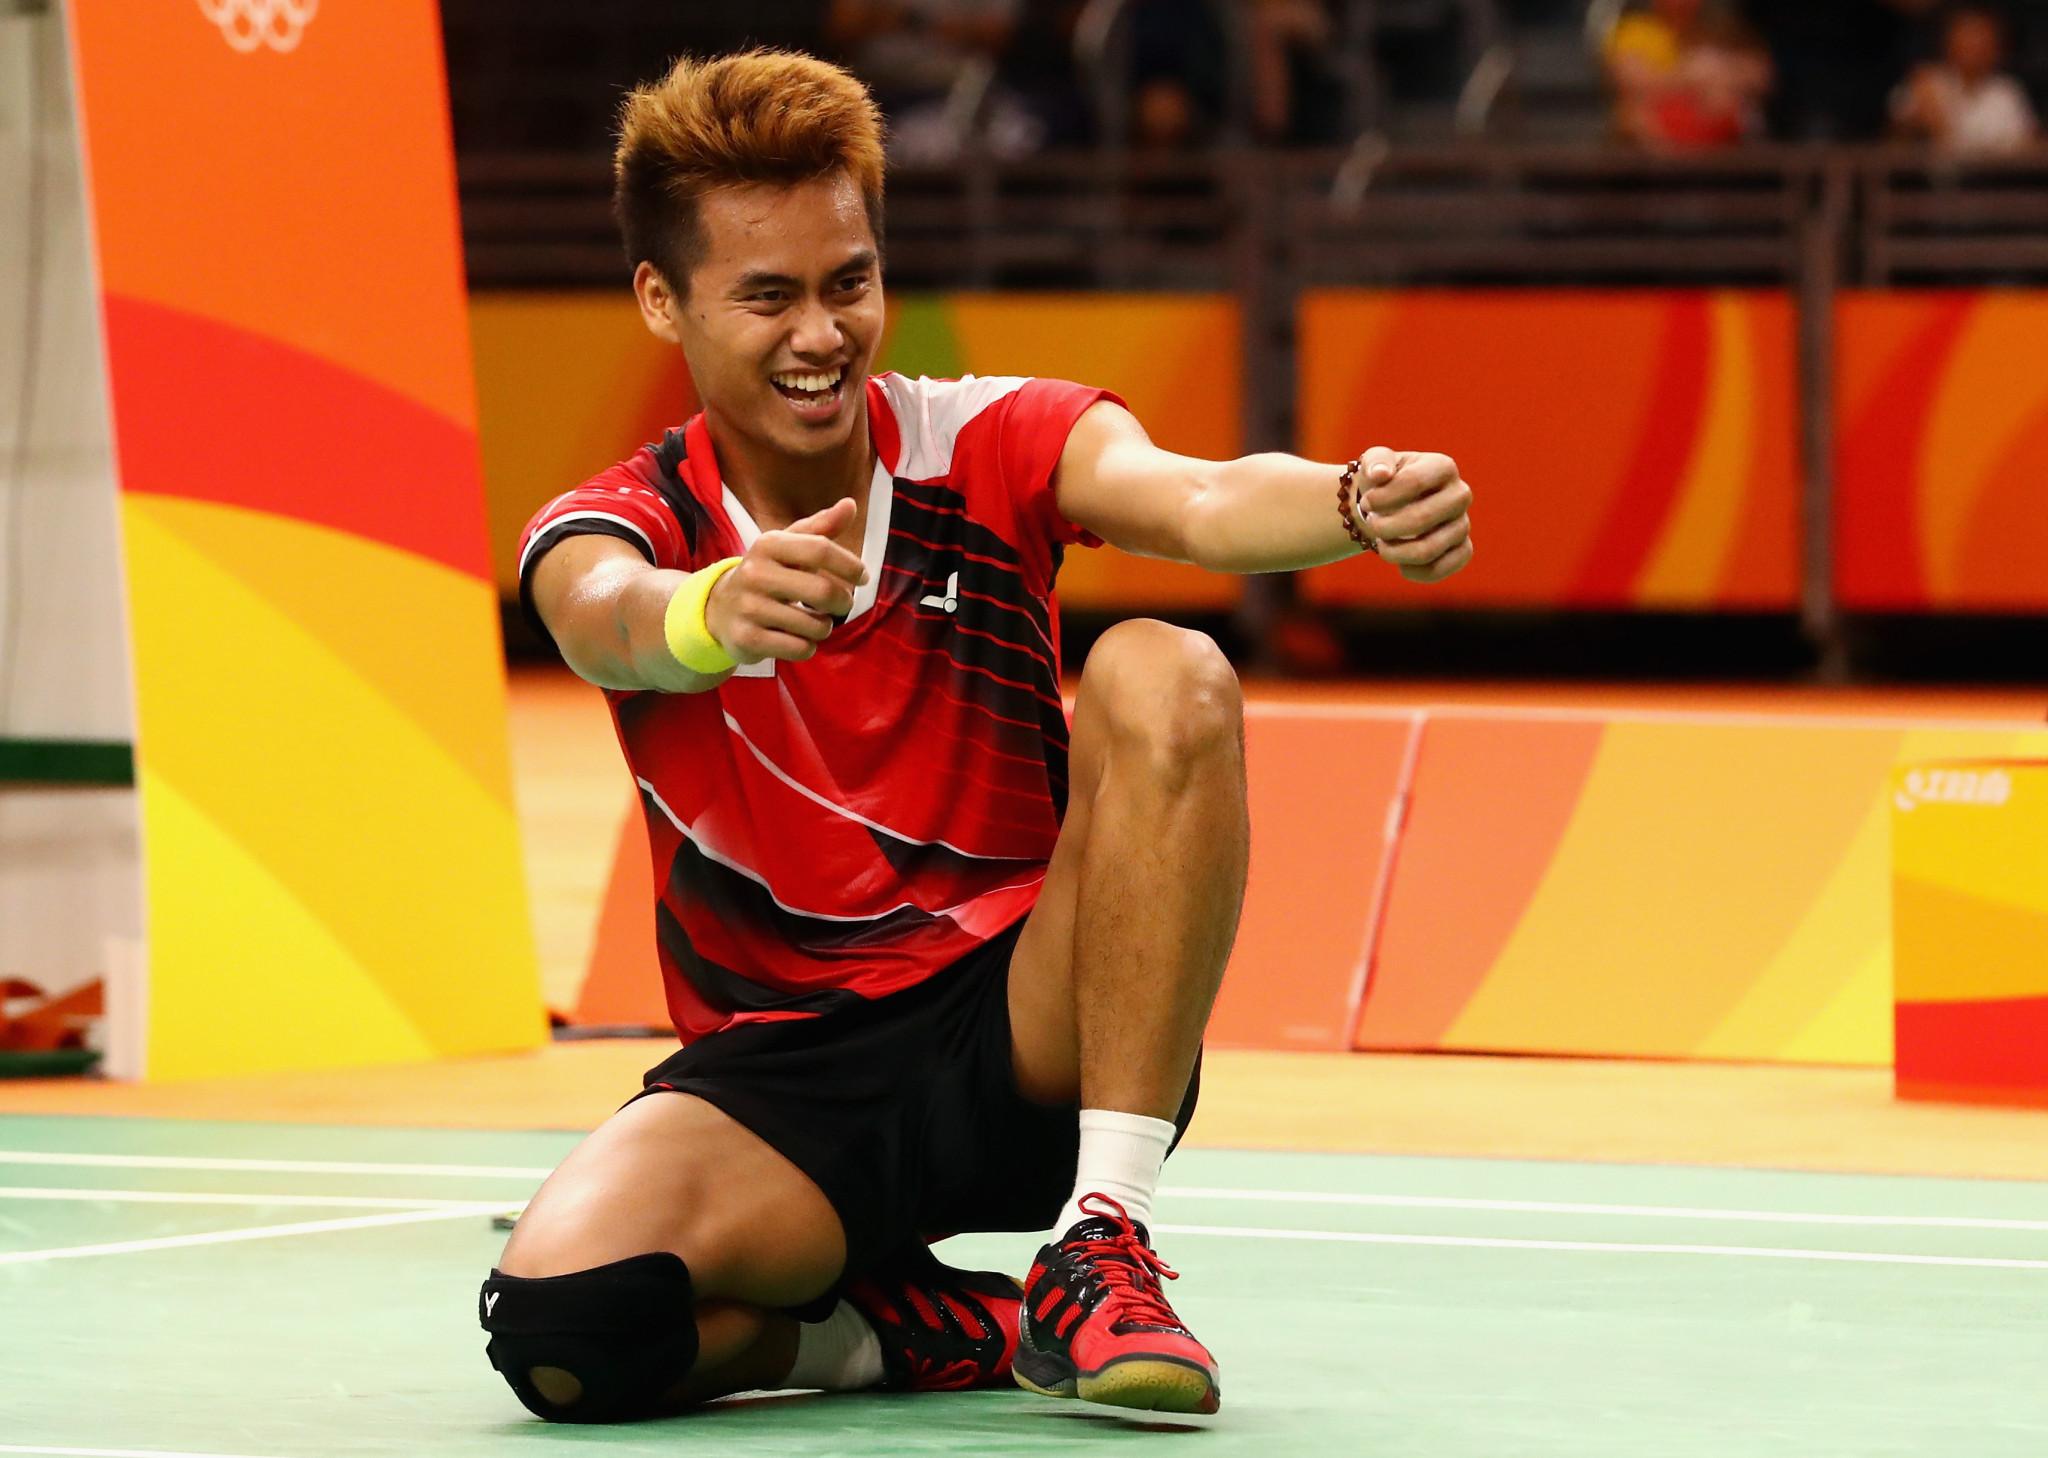 Olympic badminton champion Ahmad retires before re-arranged Tokyo 2020